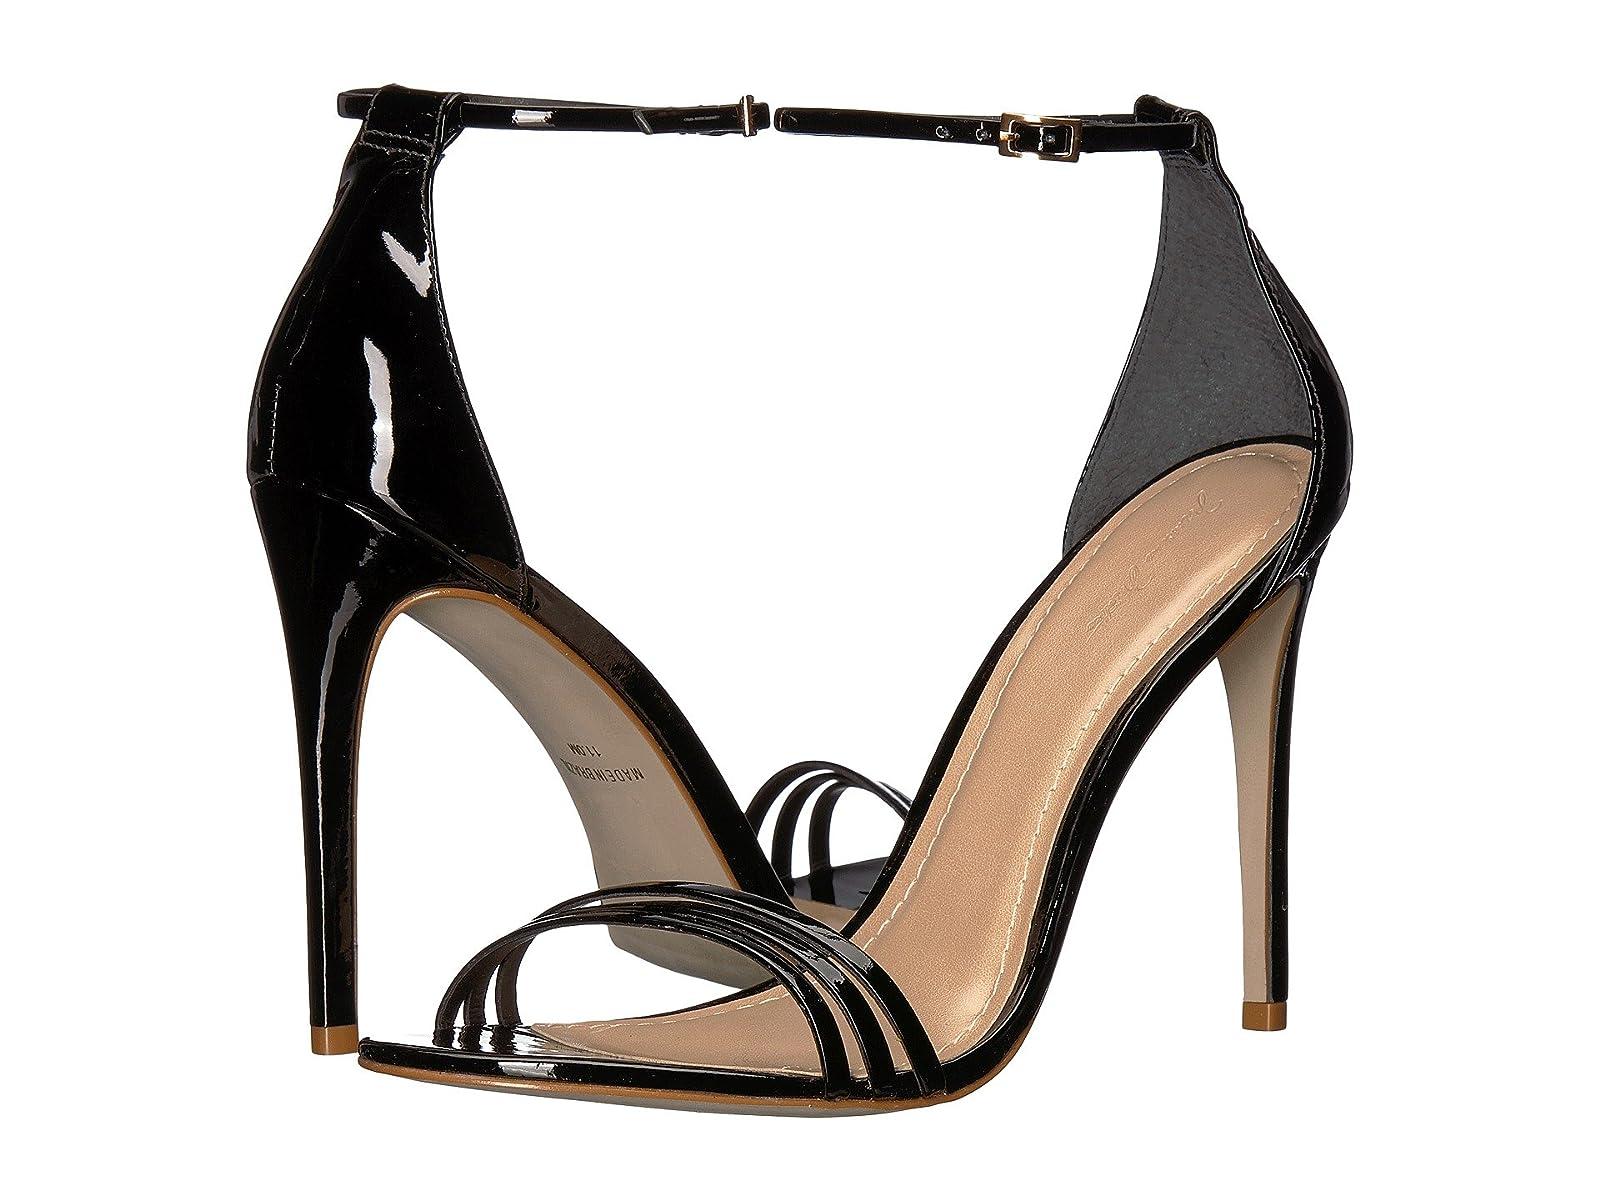 Massimo Matteo RezaAtmospheric grades have affordable shoes